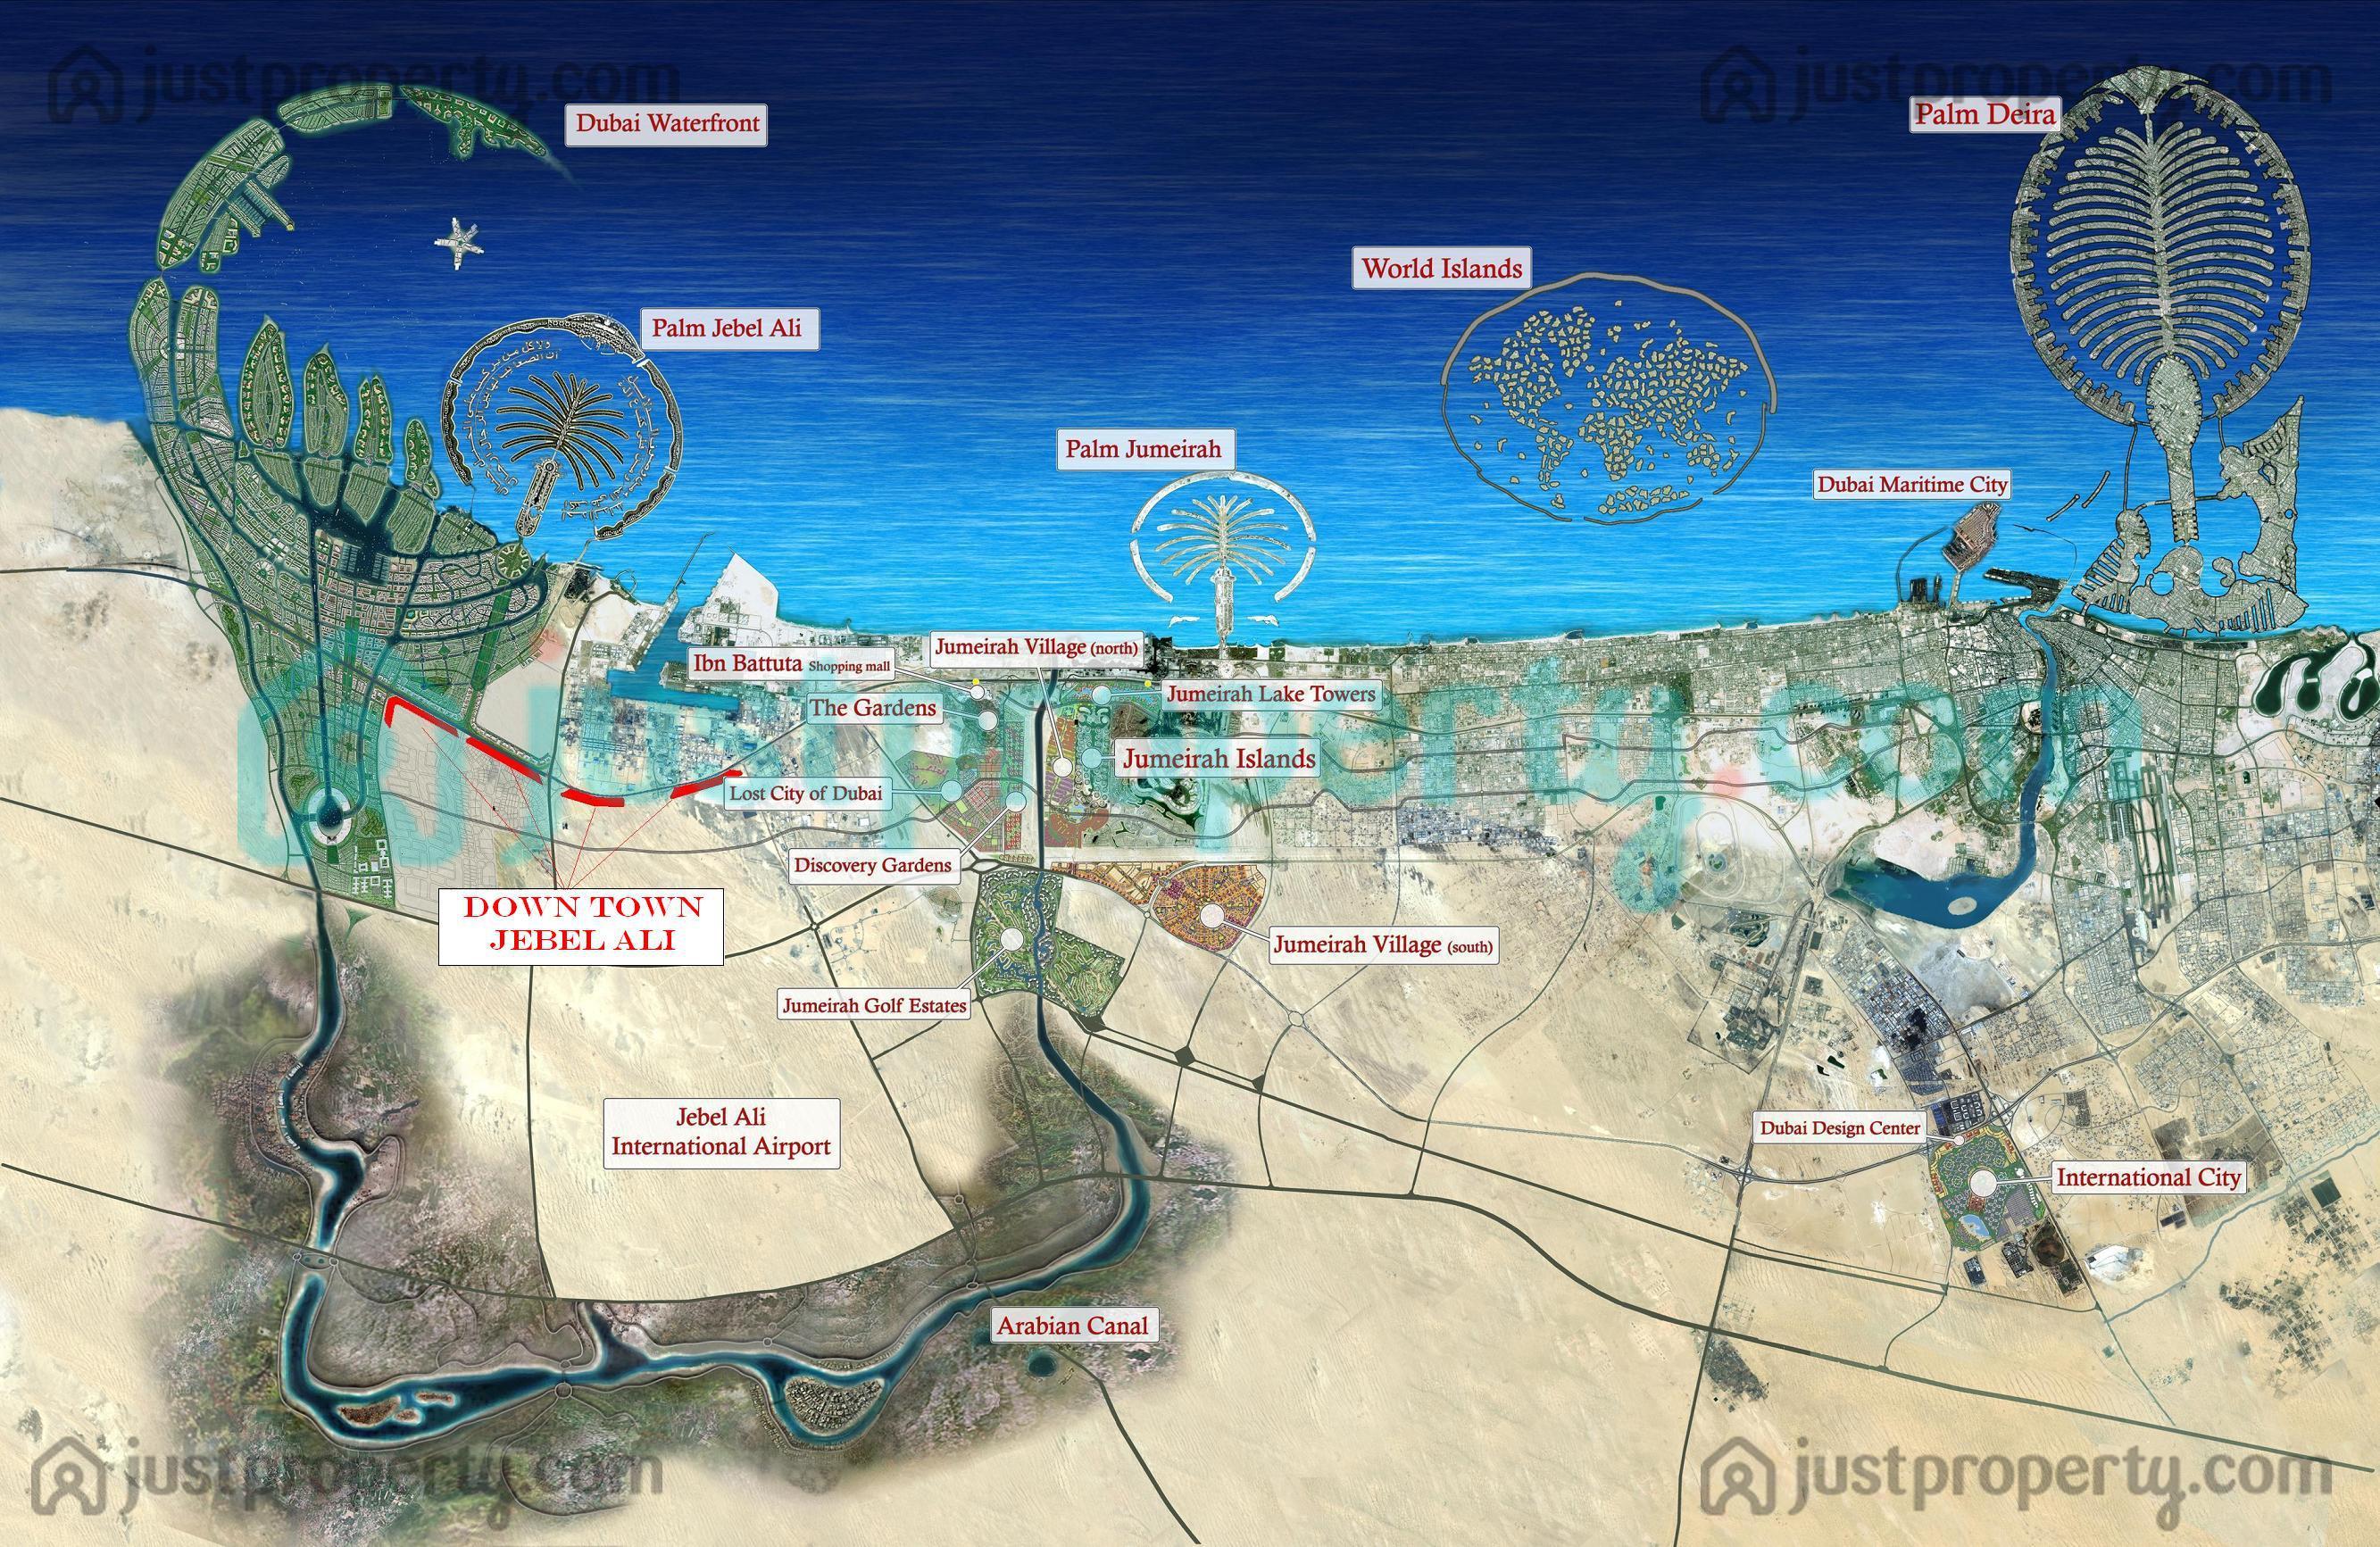 Dubai District Maps Floor Plans | JustProperty.com on